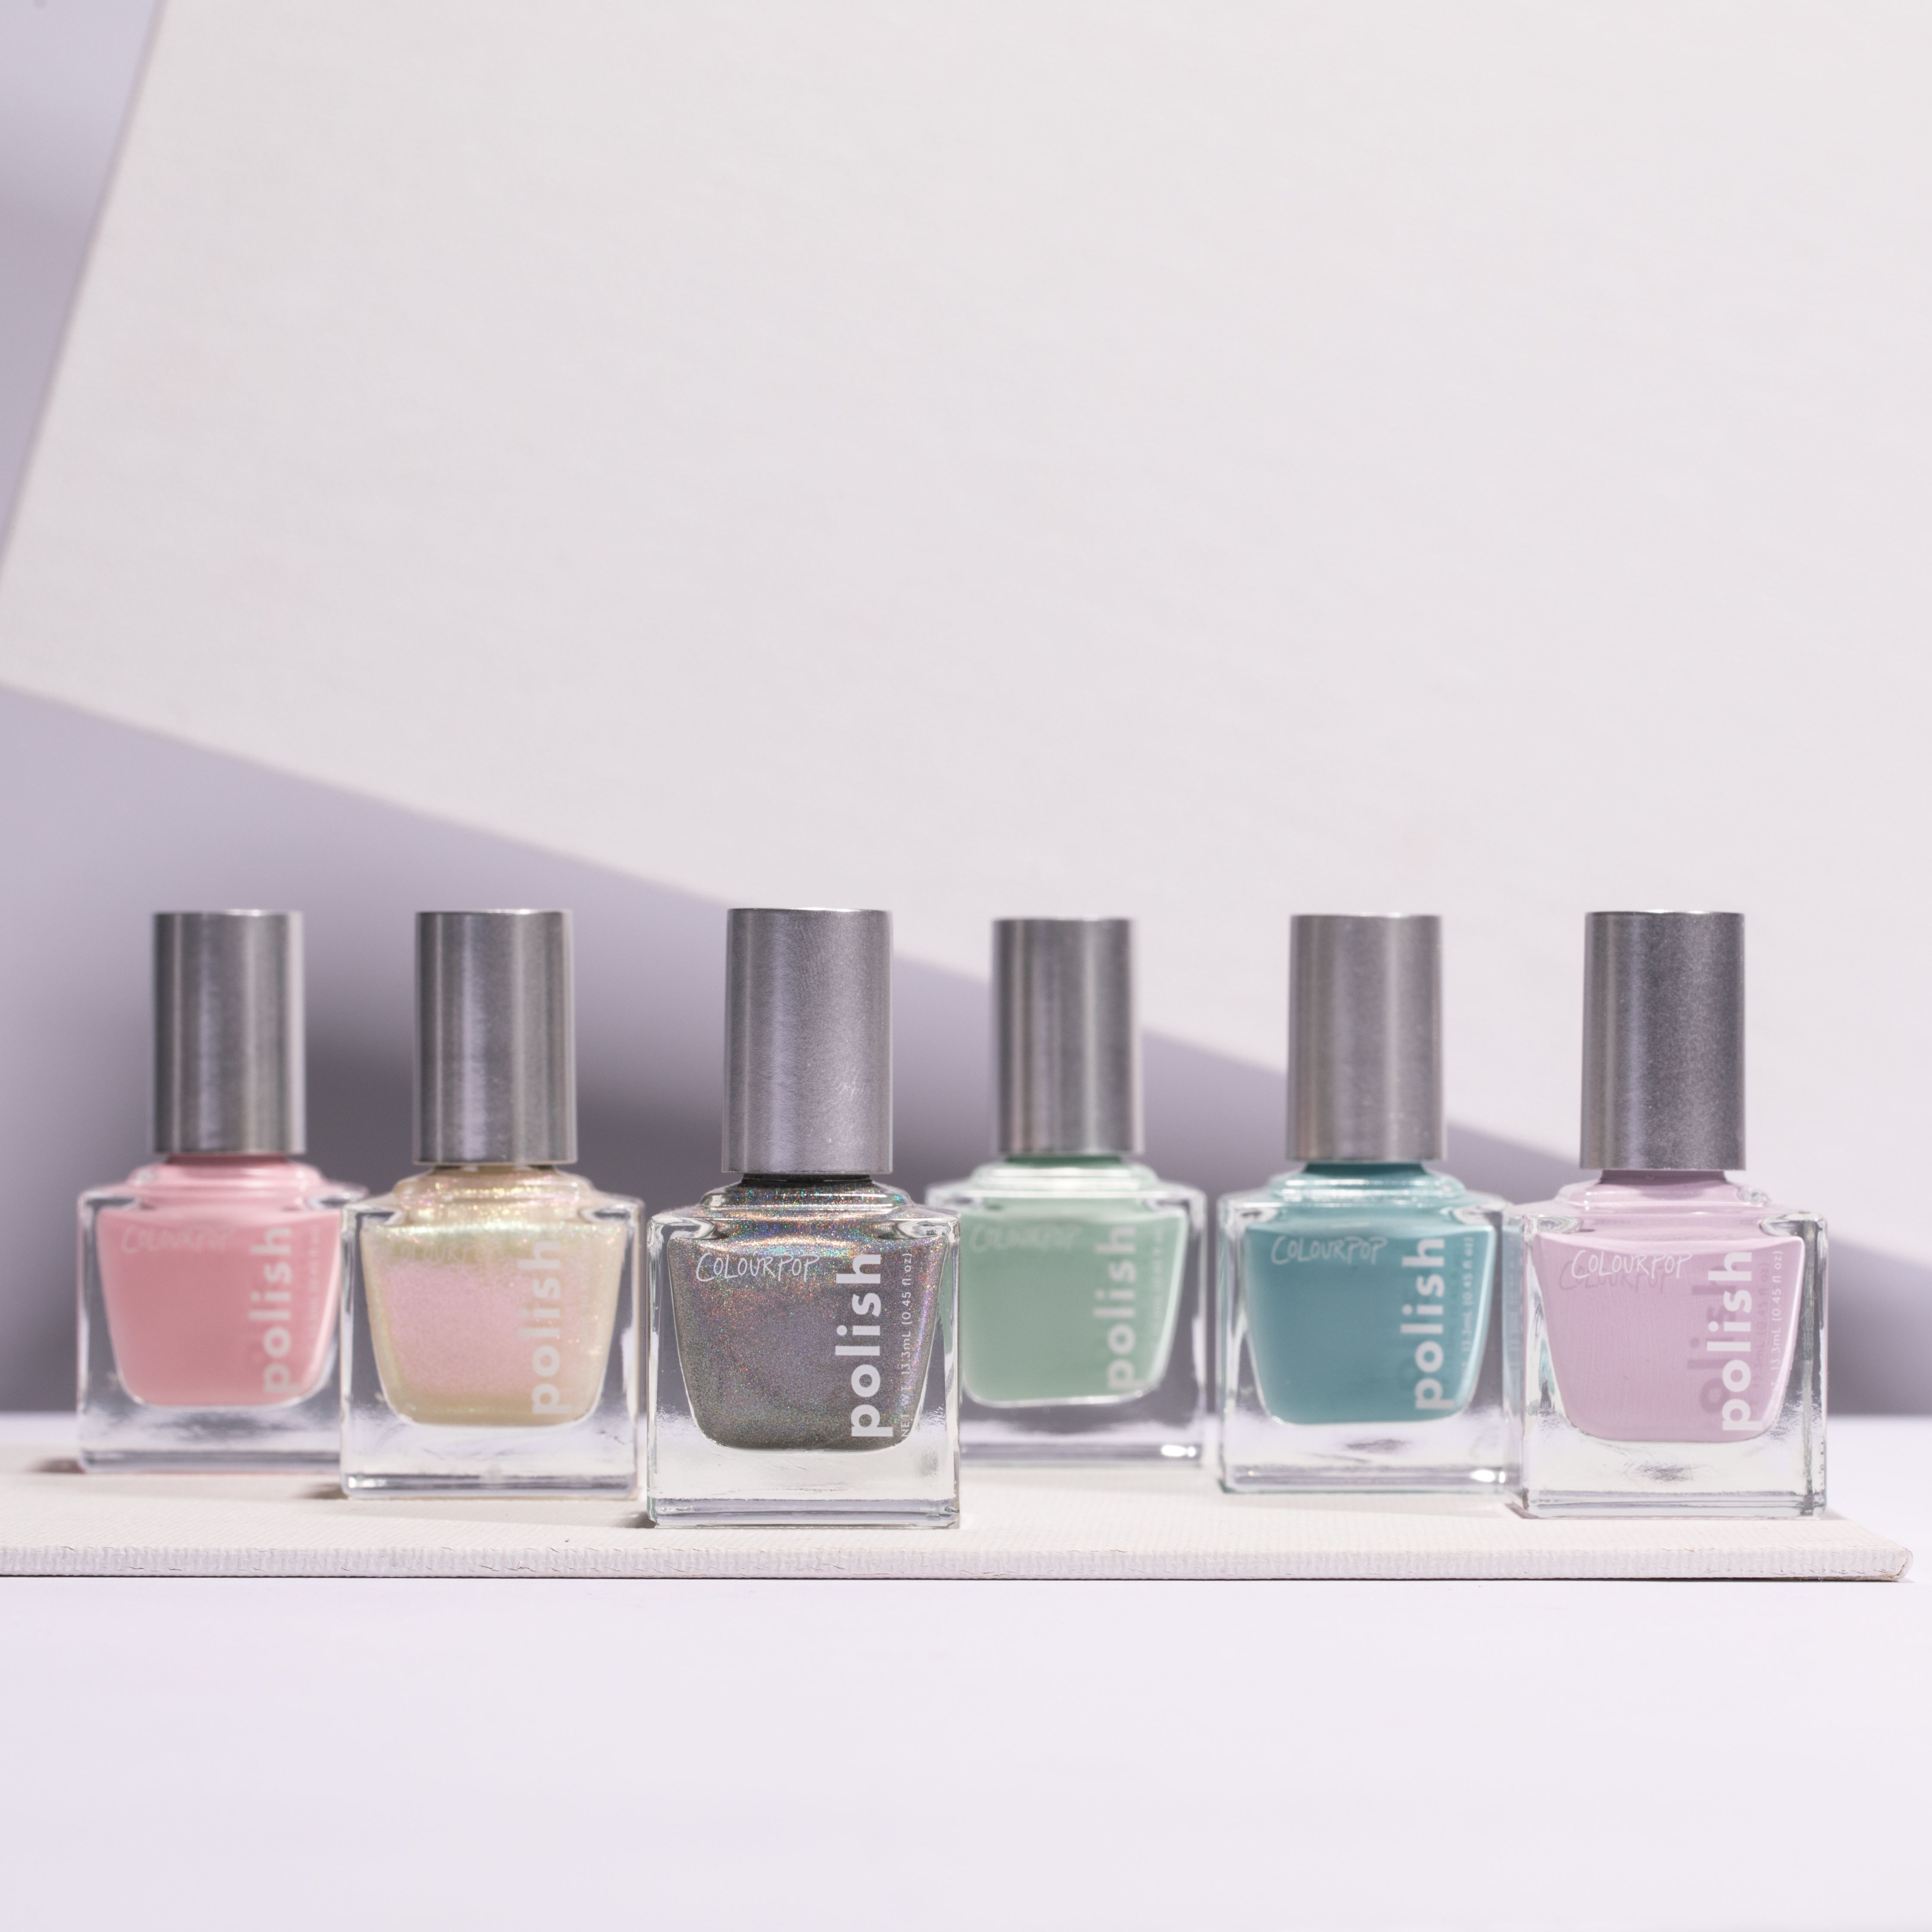 See Every Colourpop Polish Shade Colourpop Launches Nail Polish